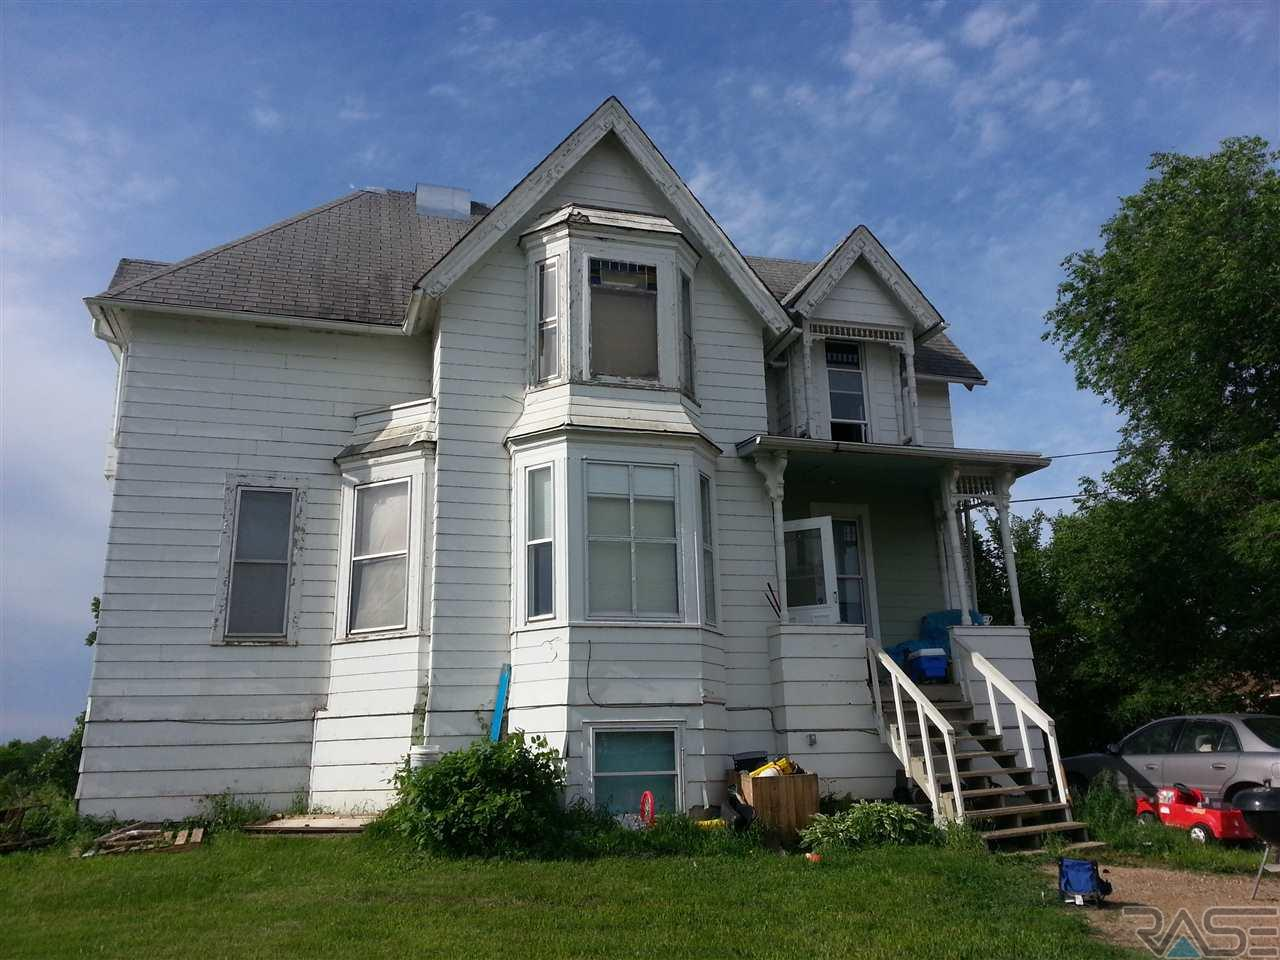 723 SE 4th St, Madison, SD 57042